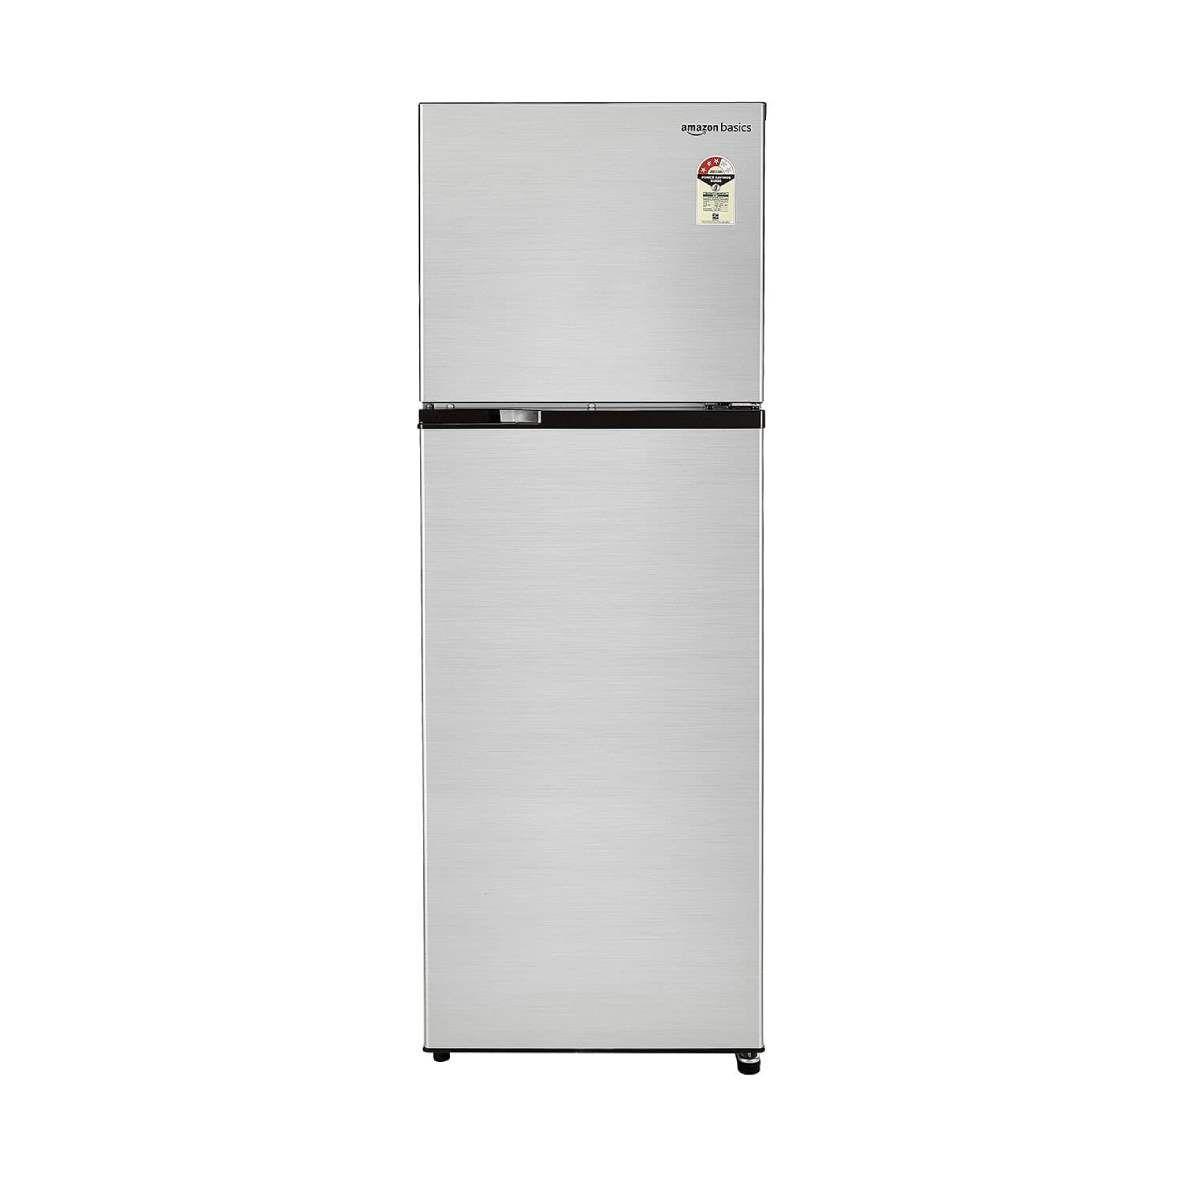 Amazon Basics 335 L Double Door Refrigerator